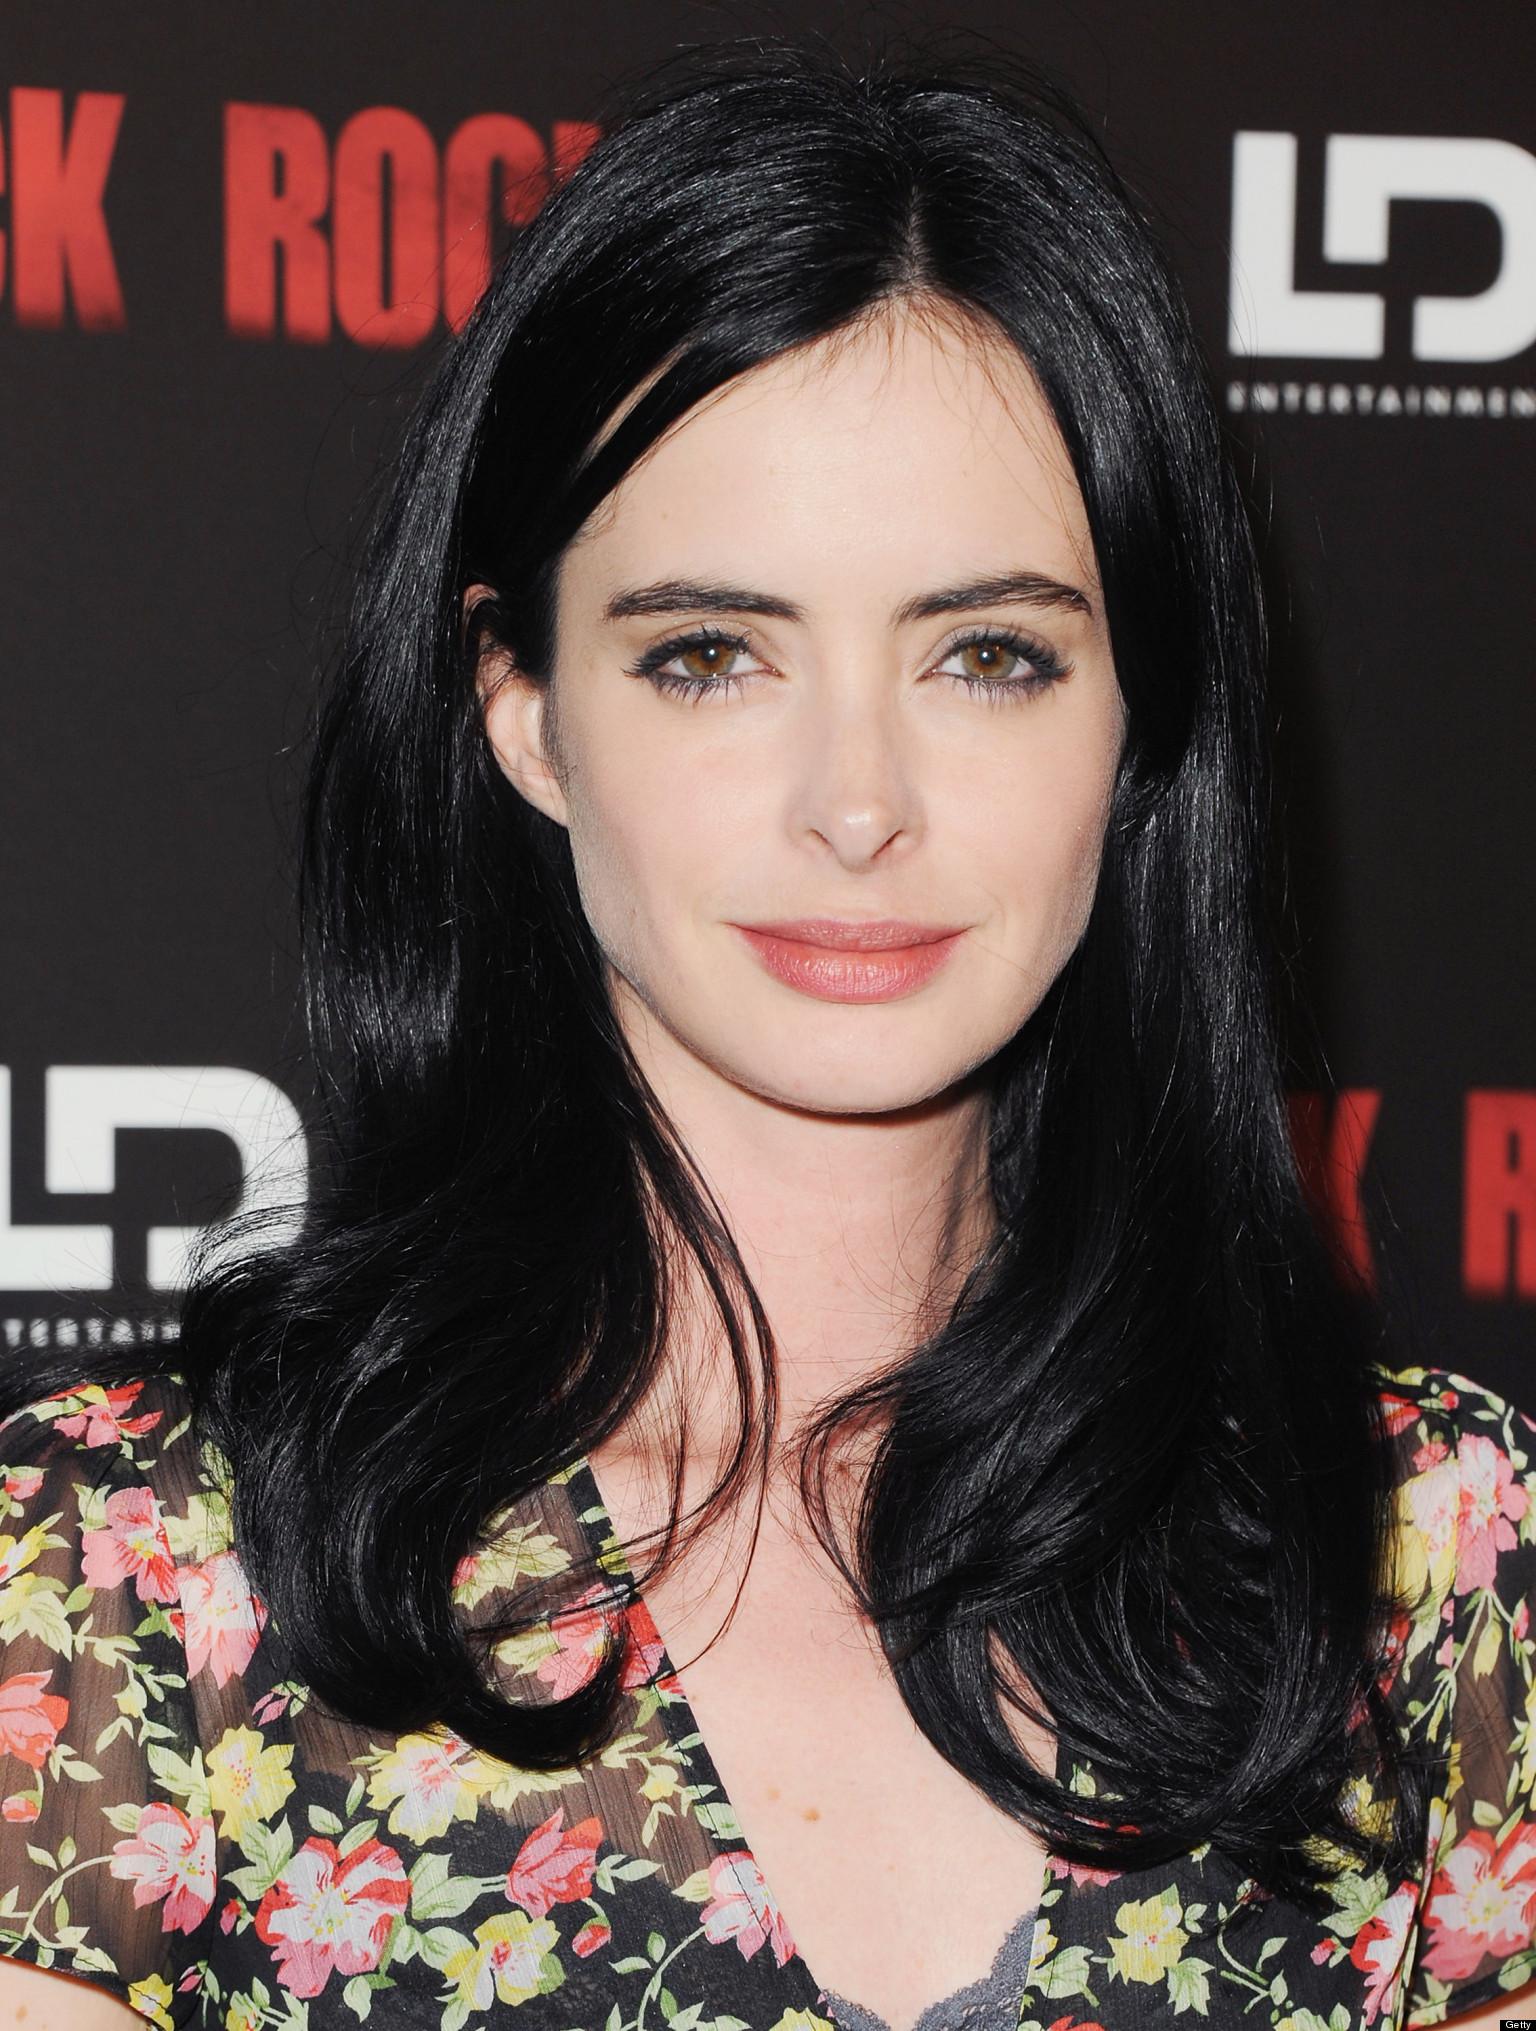 Krysten Ritter Cover: Krysten Ritter Joins 'Veronica Mars' Movie